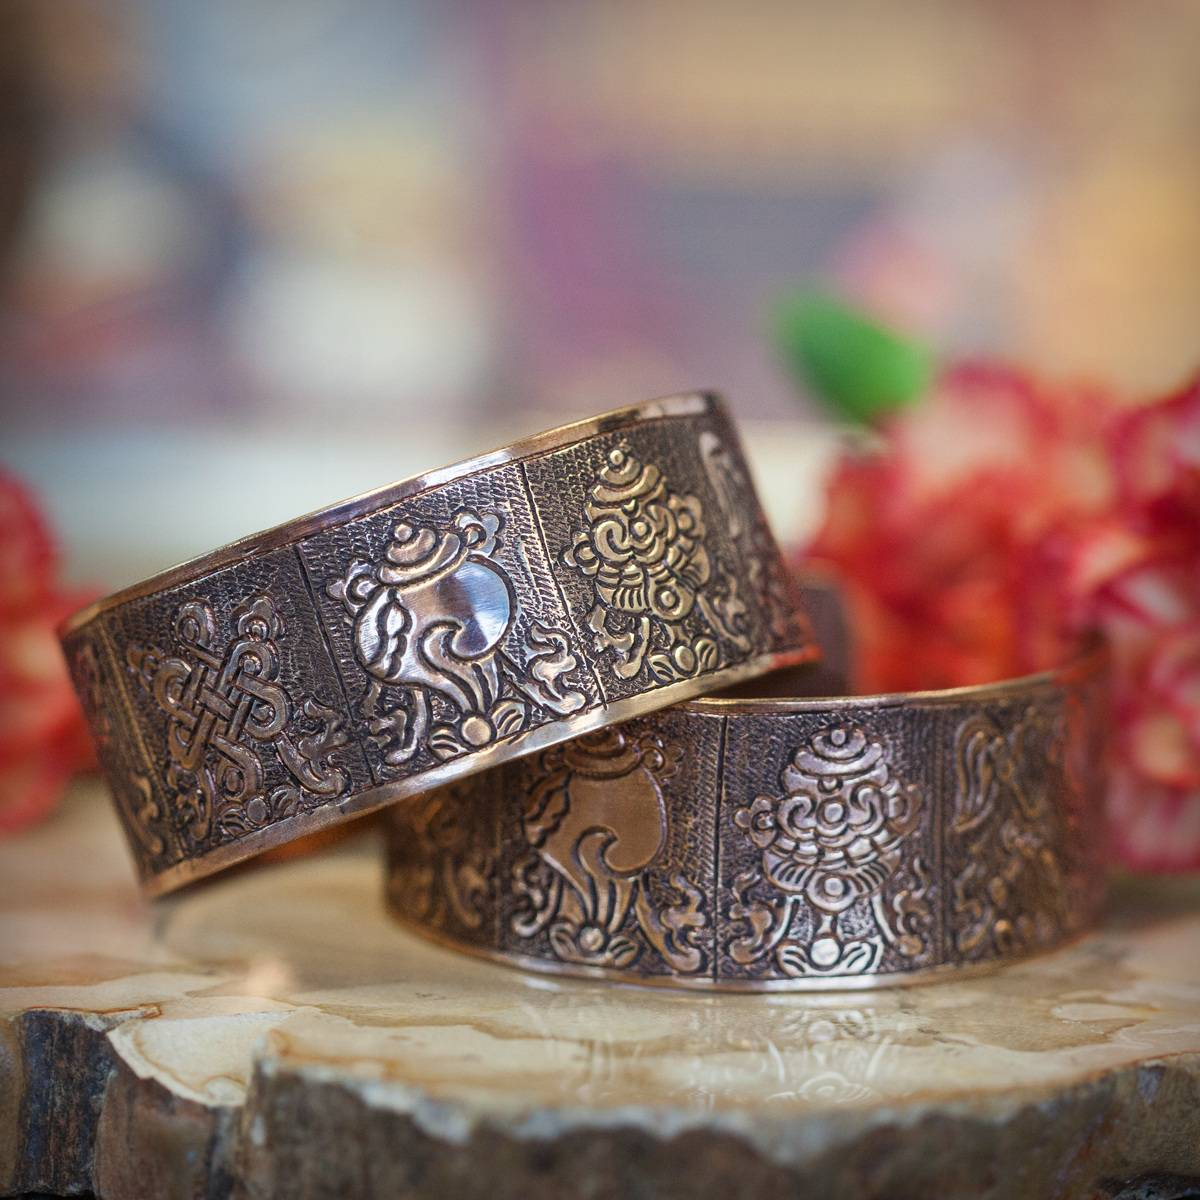 Tibetan Auspicious Symbols Bracelet_1of2_7_31